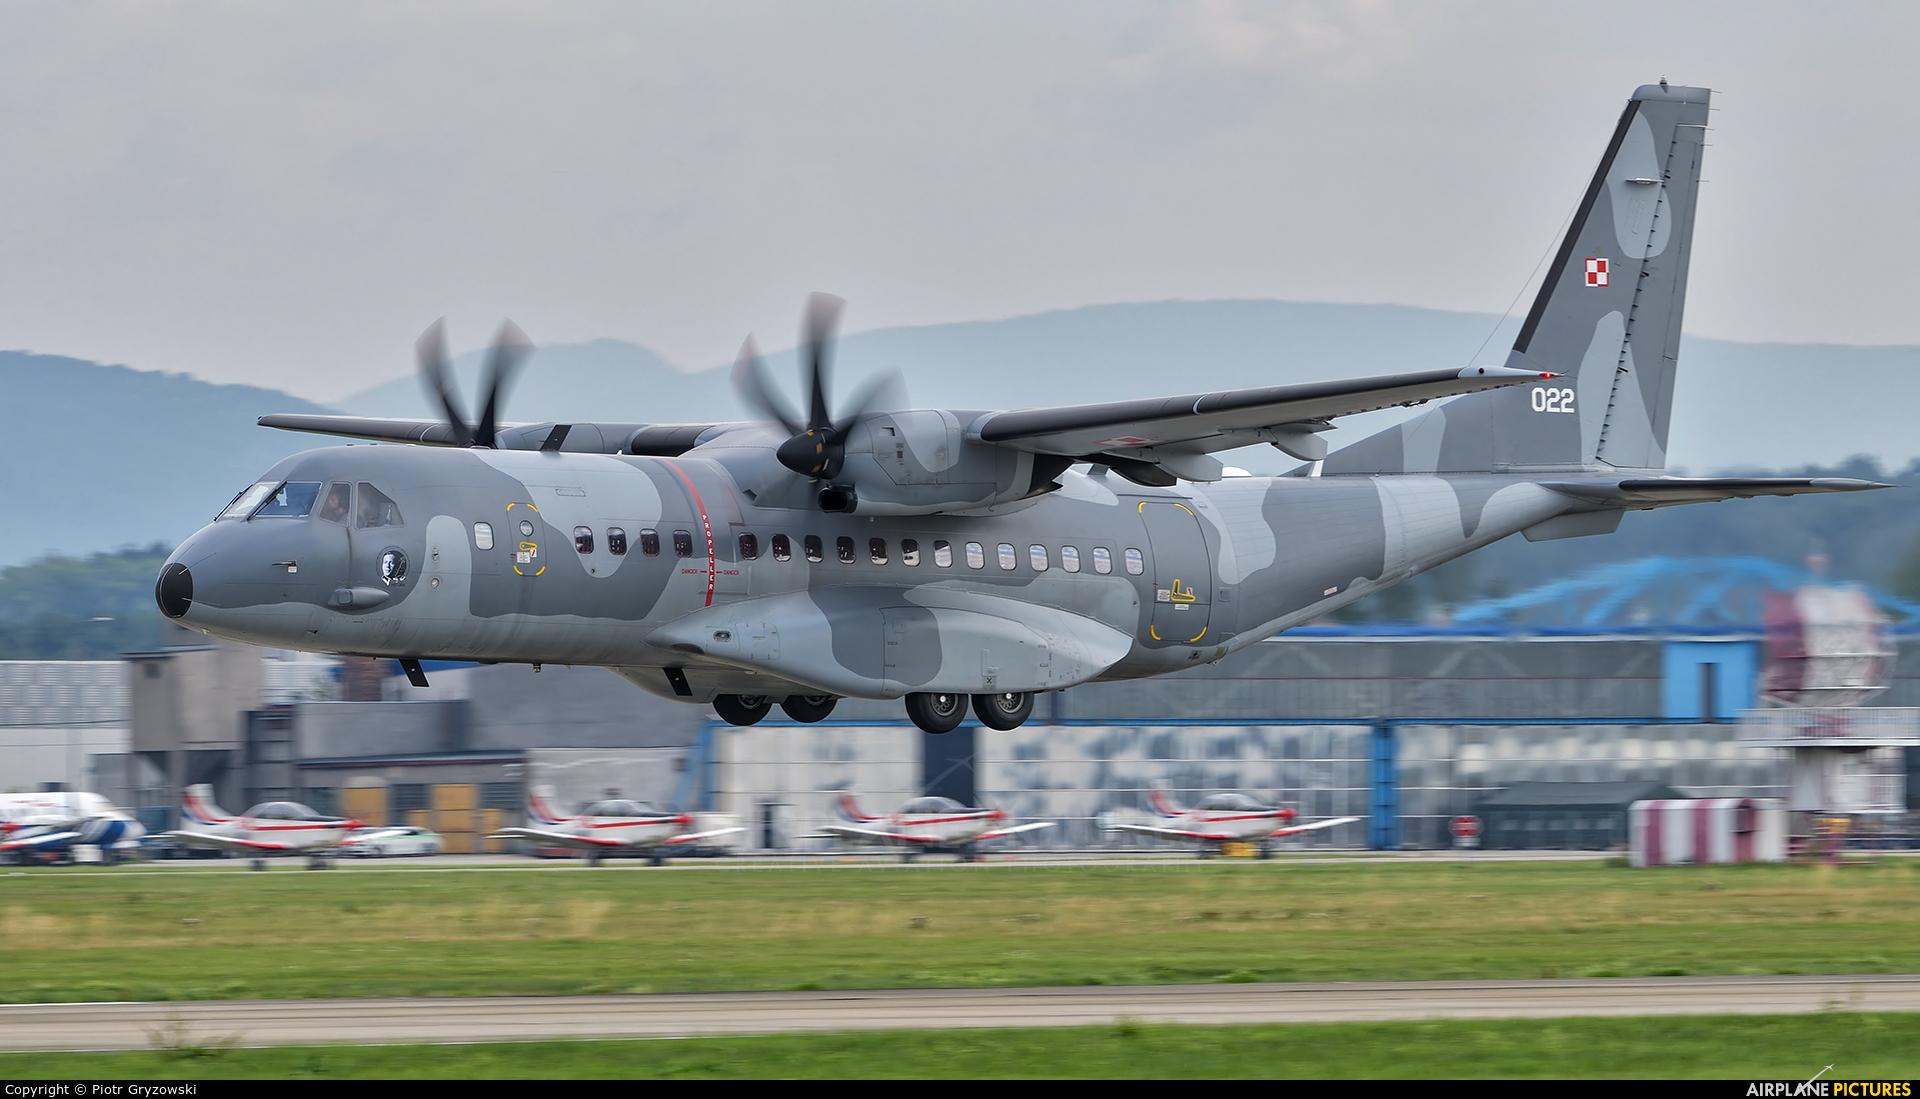 Poland - Air Force 022 aircraft at Ostrava Mošnov